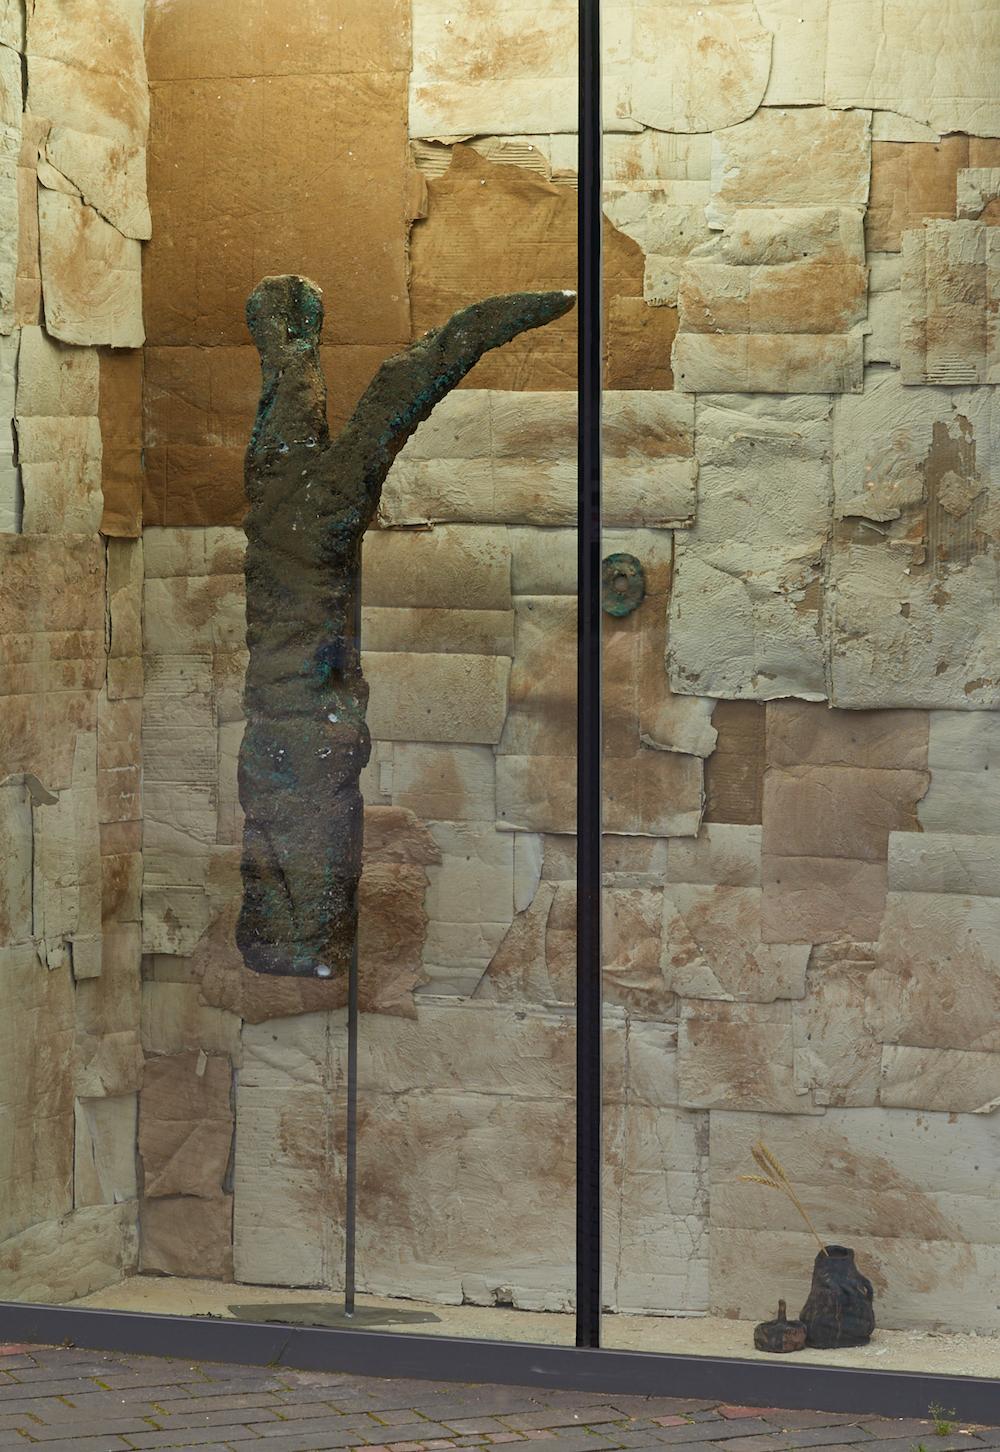 Emii Alrai, The Full Crescent, 2019. Steel armature, polystyrene, copper leaf, plaster, sand, clay, oxides, tar paint. Dimensions variable. Photographer Jonathan Bassett.